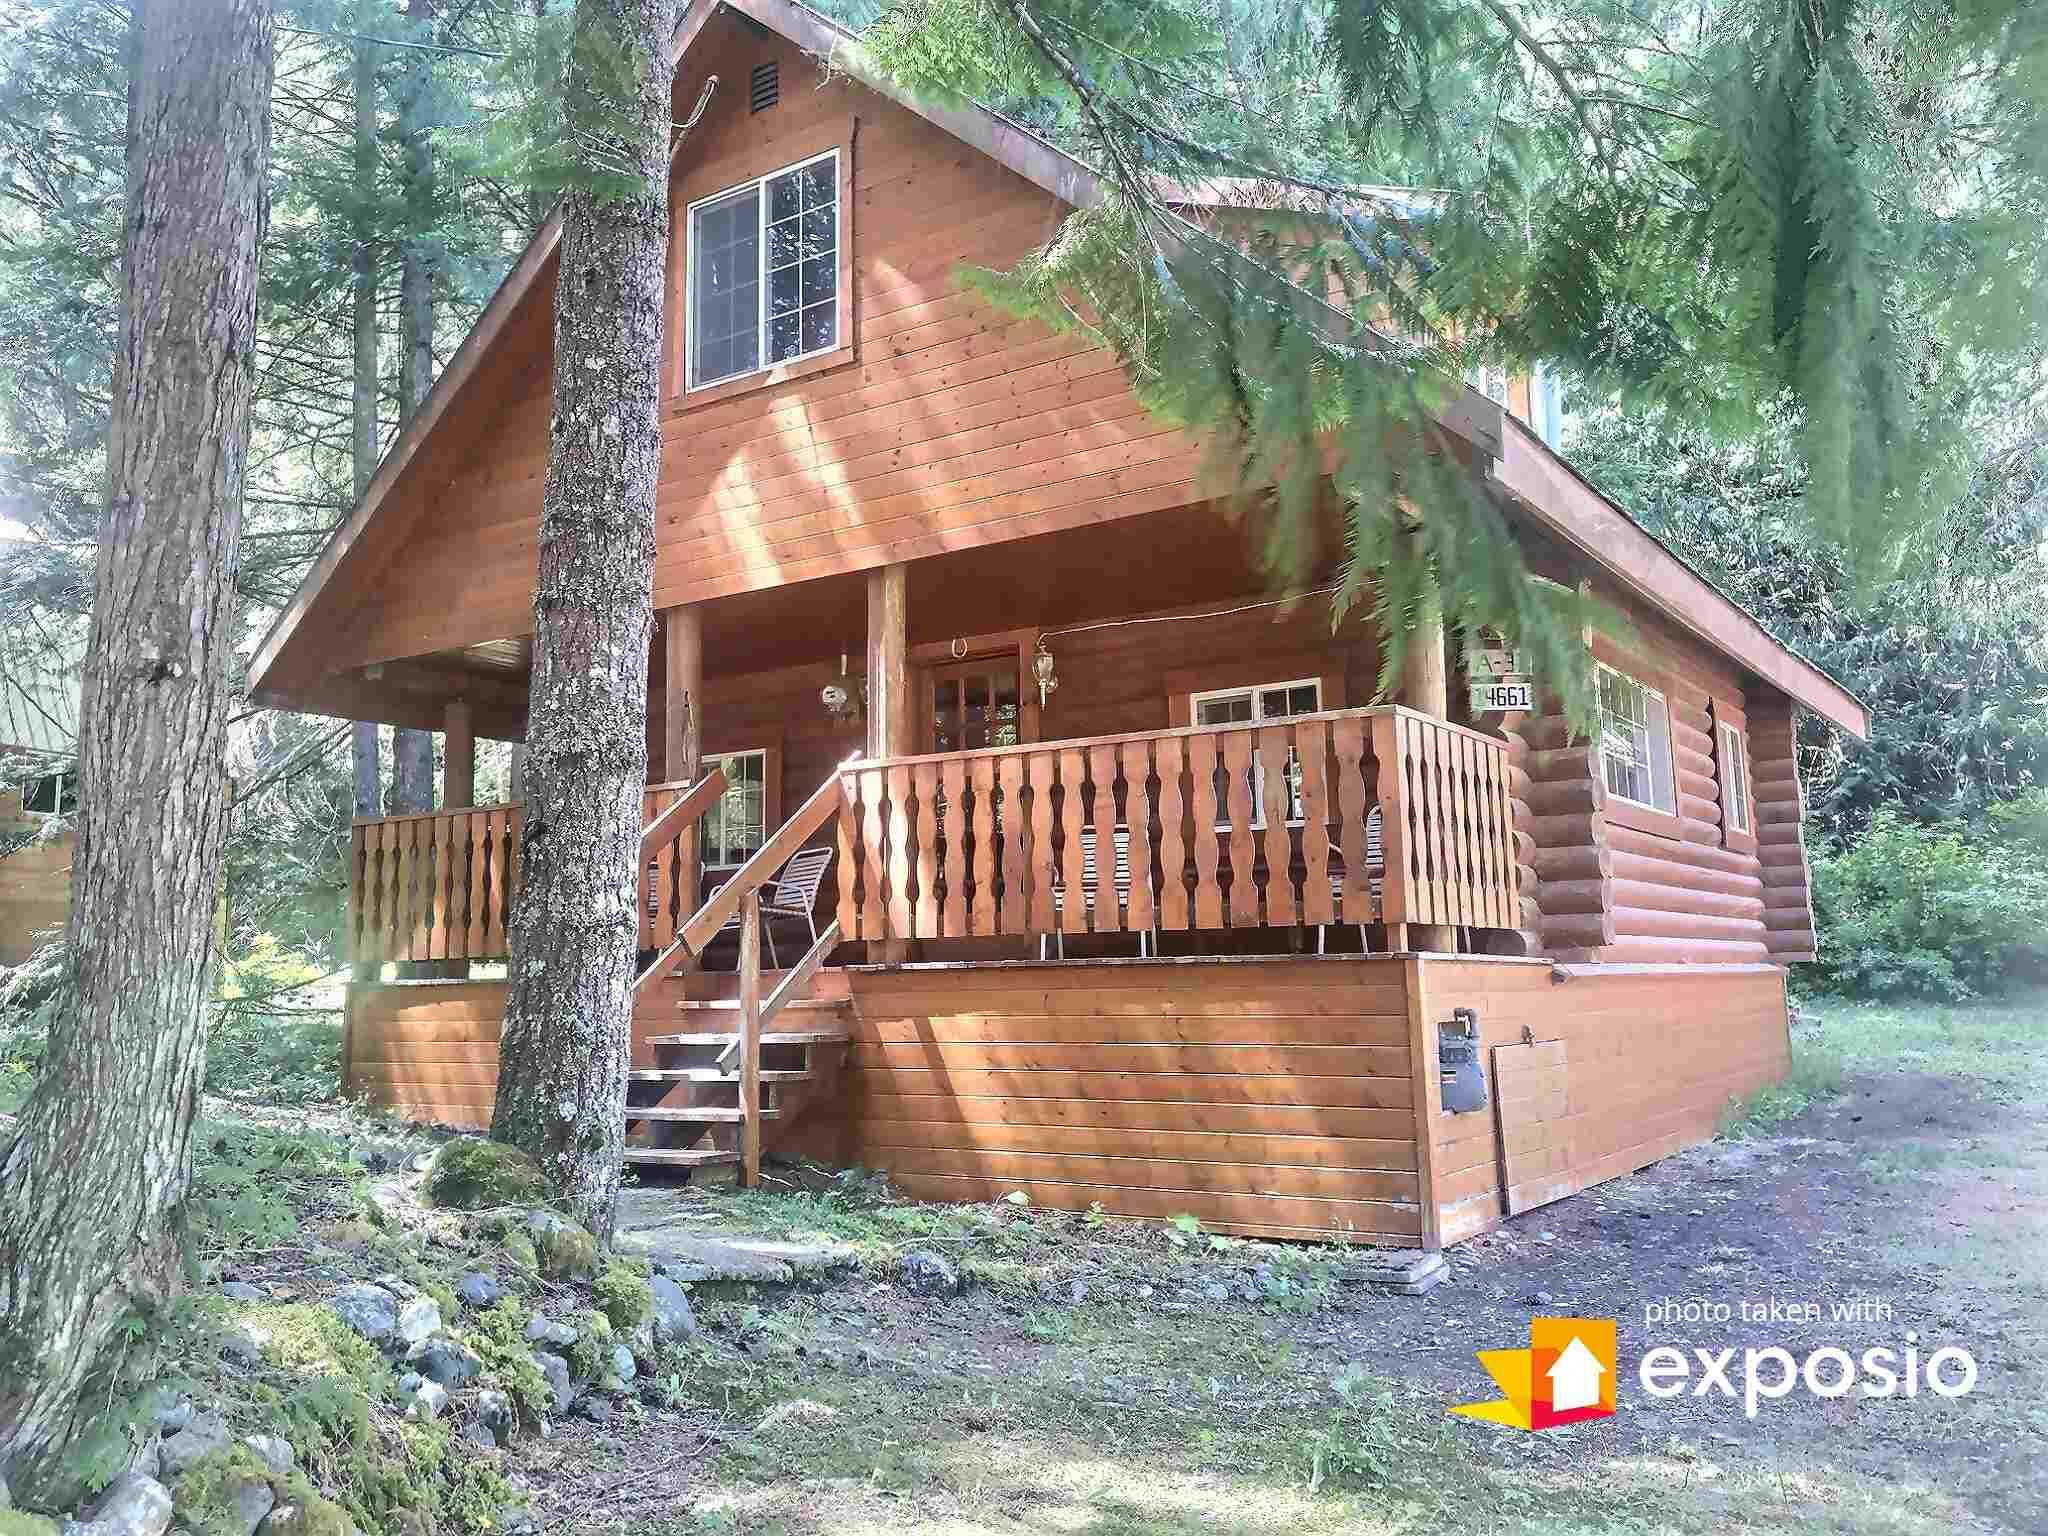 14661 ALPINE BOULEVARD - Hope Sunshine Valley House/Single Family for sale, 2 Bedrooms (R2599572) - #1